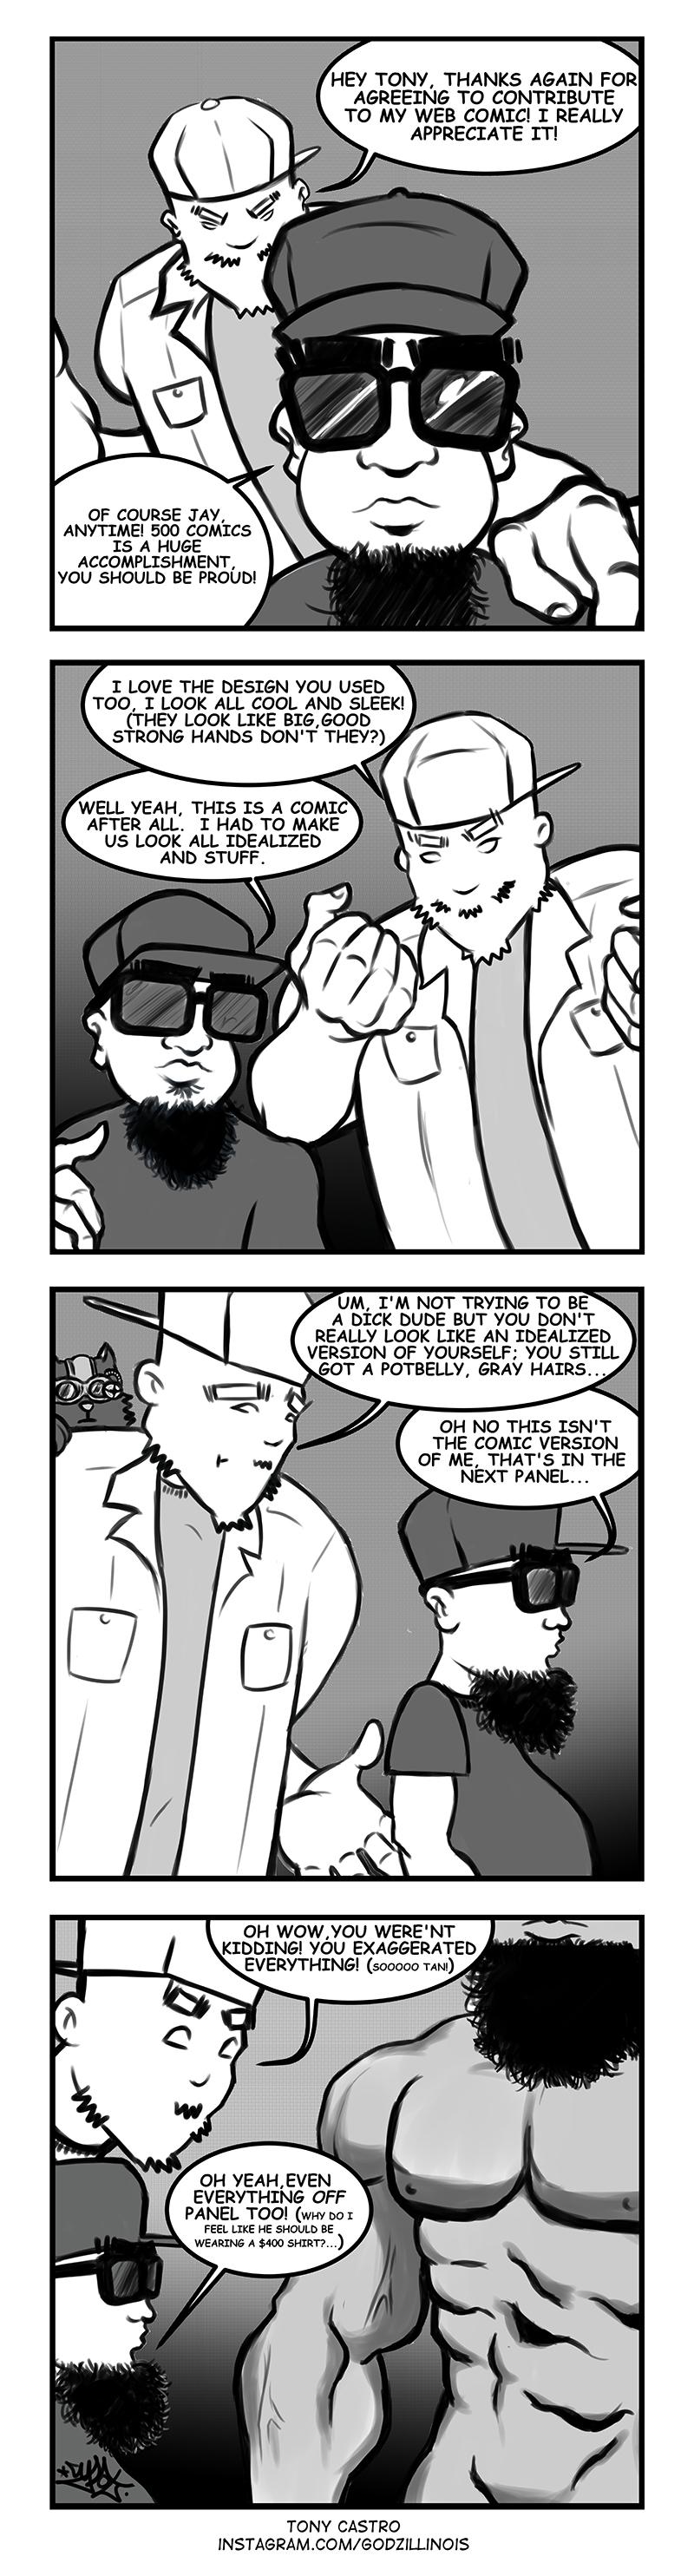 507 – Guest Comic – Tony Castro